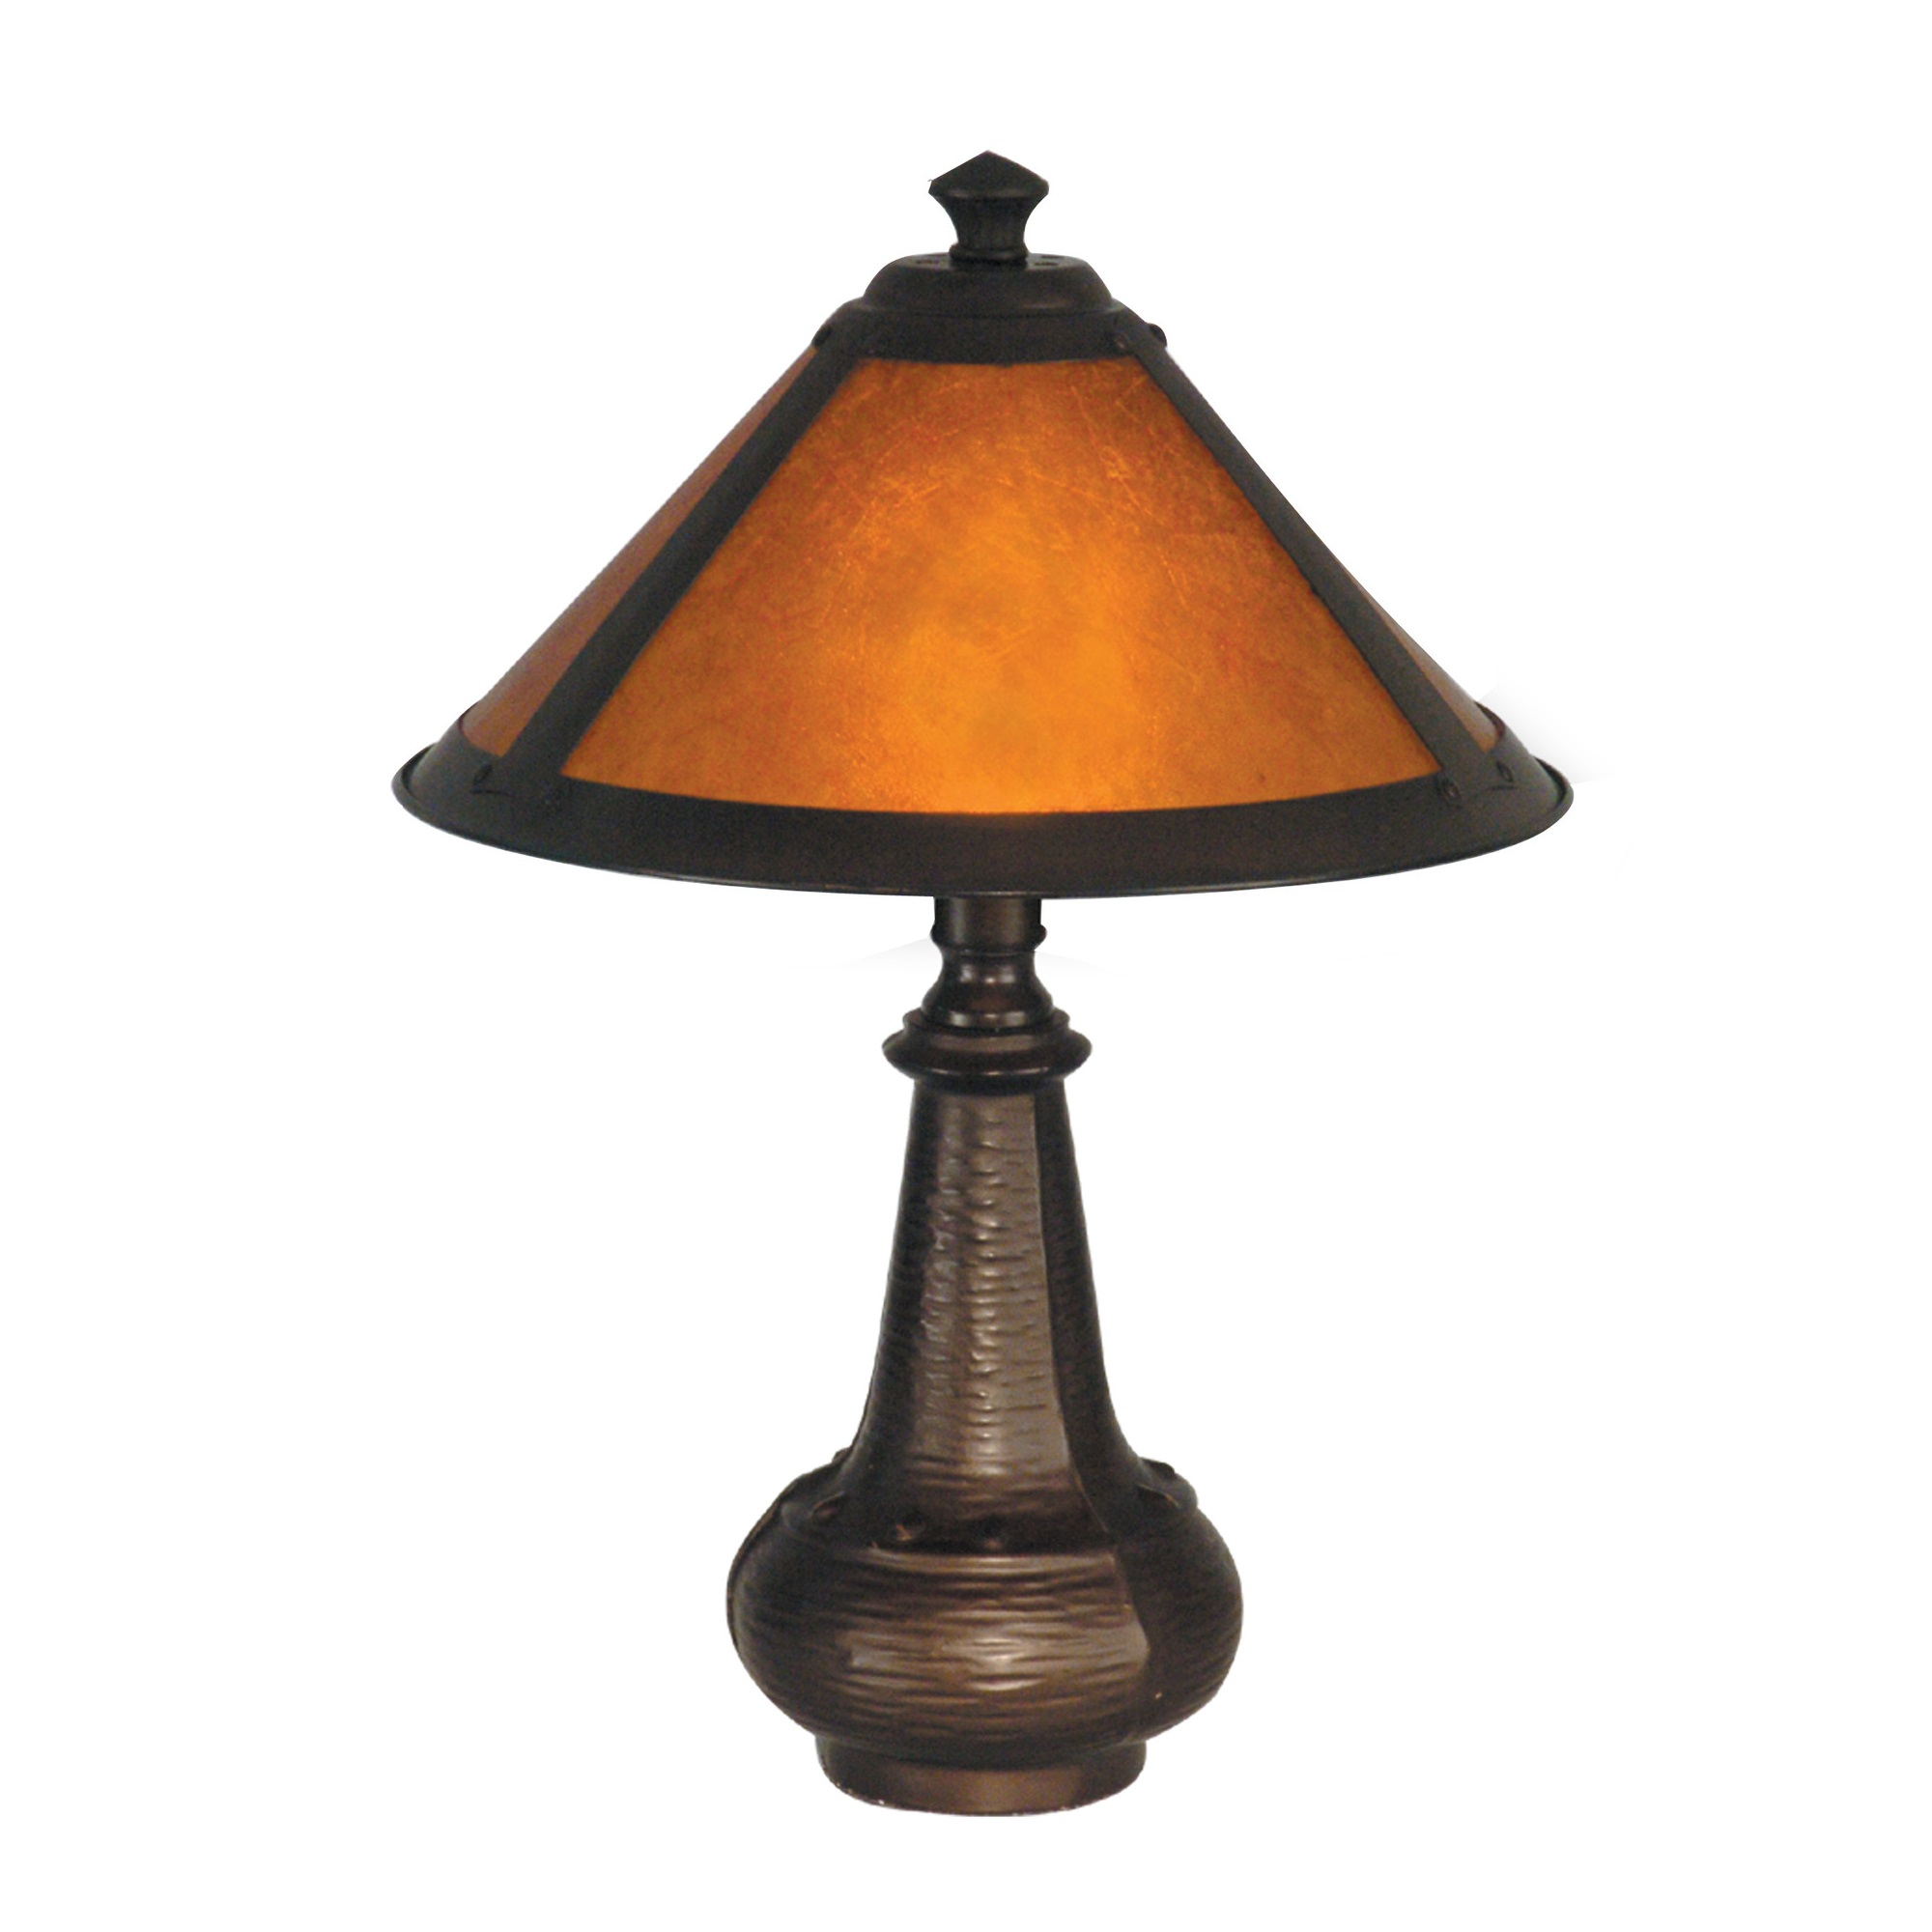 Antique Silver Table Lamp 24 Cream Accent Lighting: Dale Tiffany Hunter Mica Accent Table Lamp L Brilliant